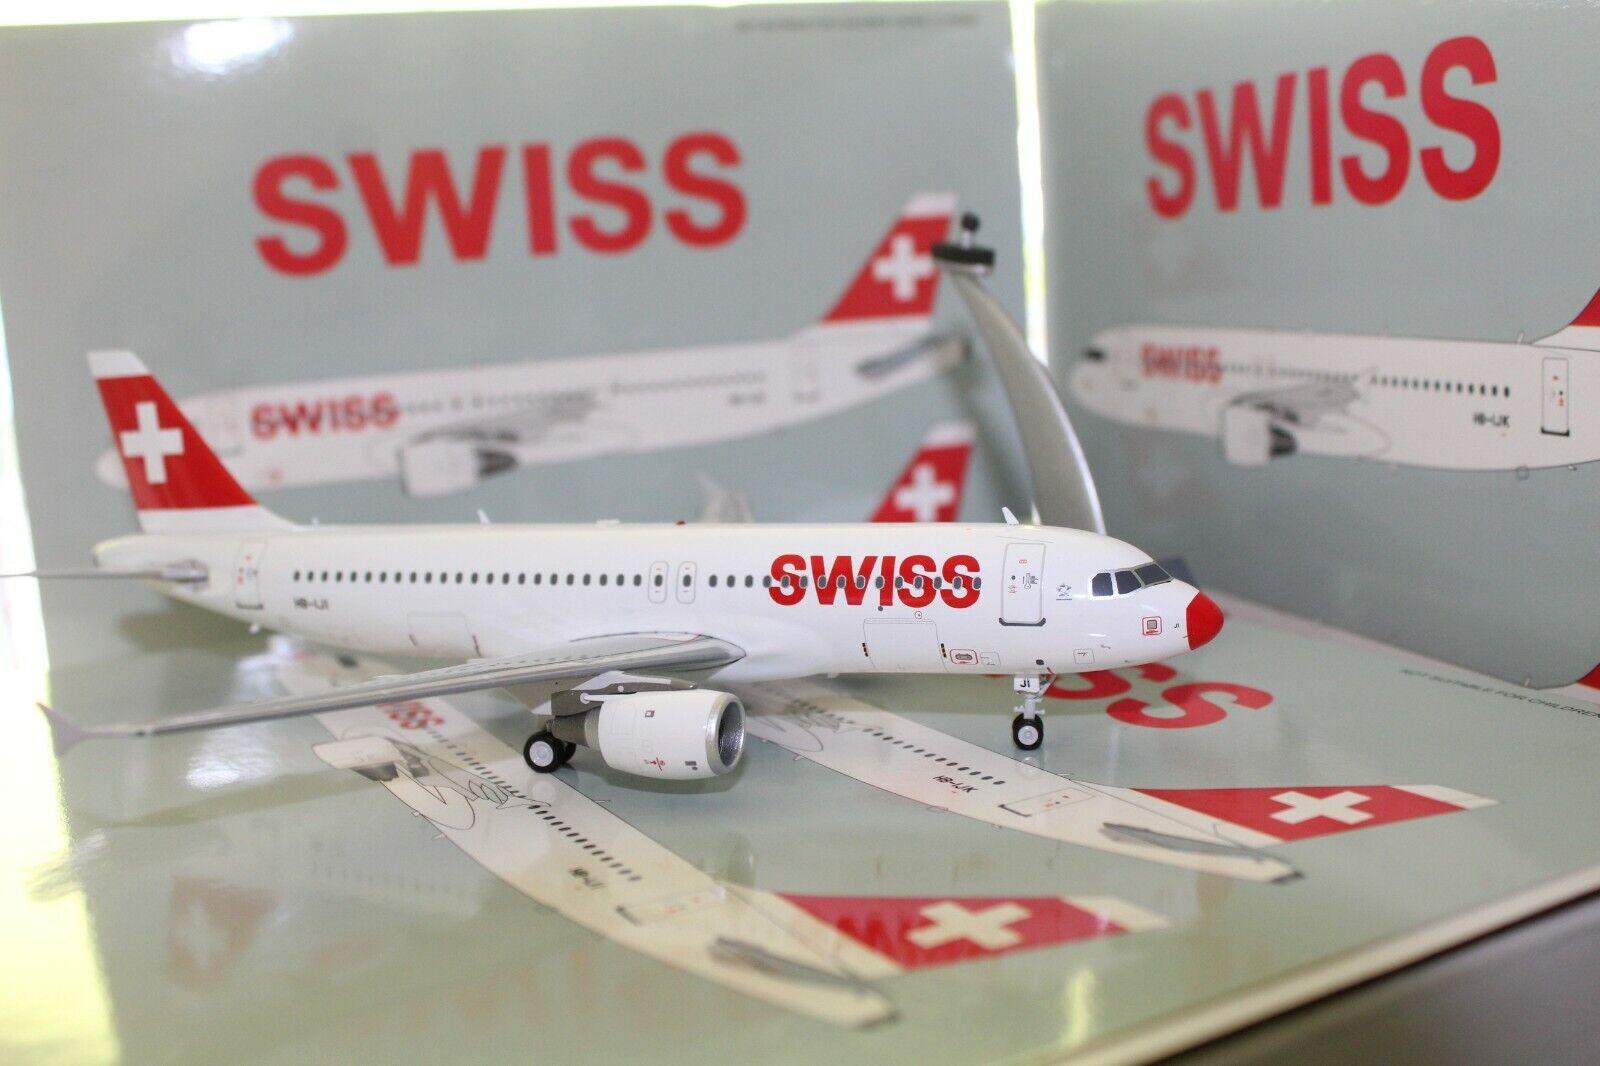 nuevo estilo Swiss A320-200  rojo Nose  (HB-IJI), (HB-IJI), (HB-IJI), 1 200, JFox  productos creativos